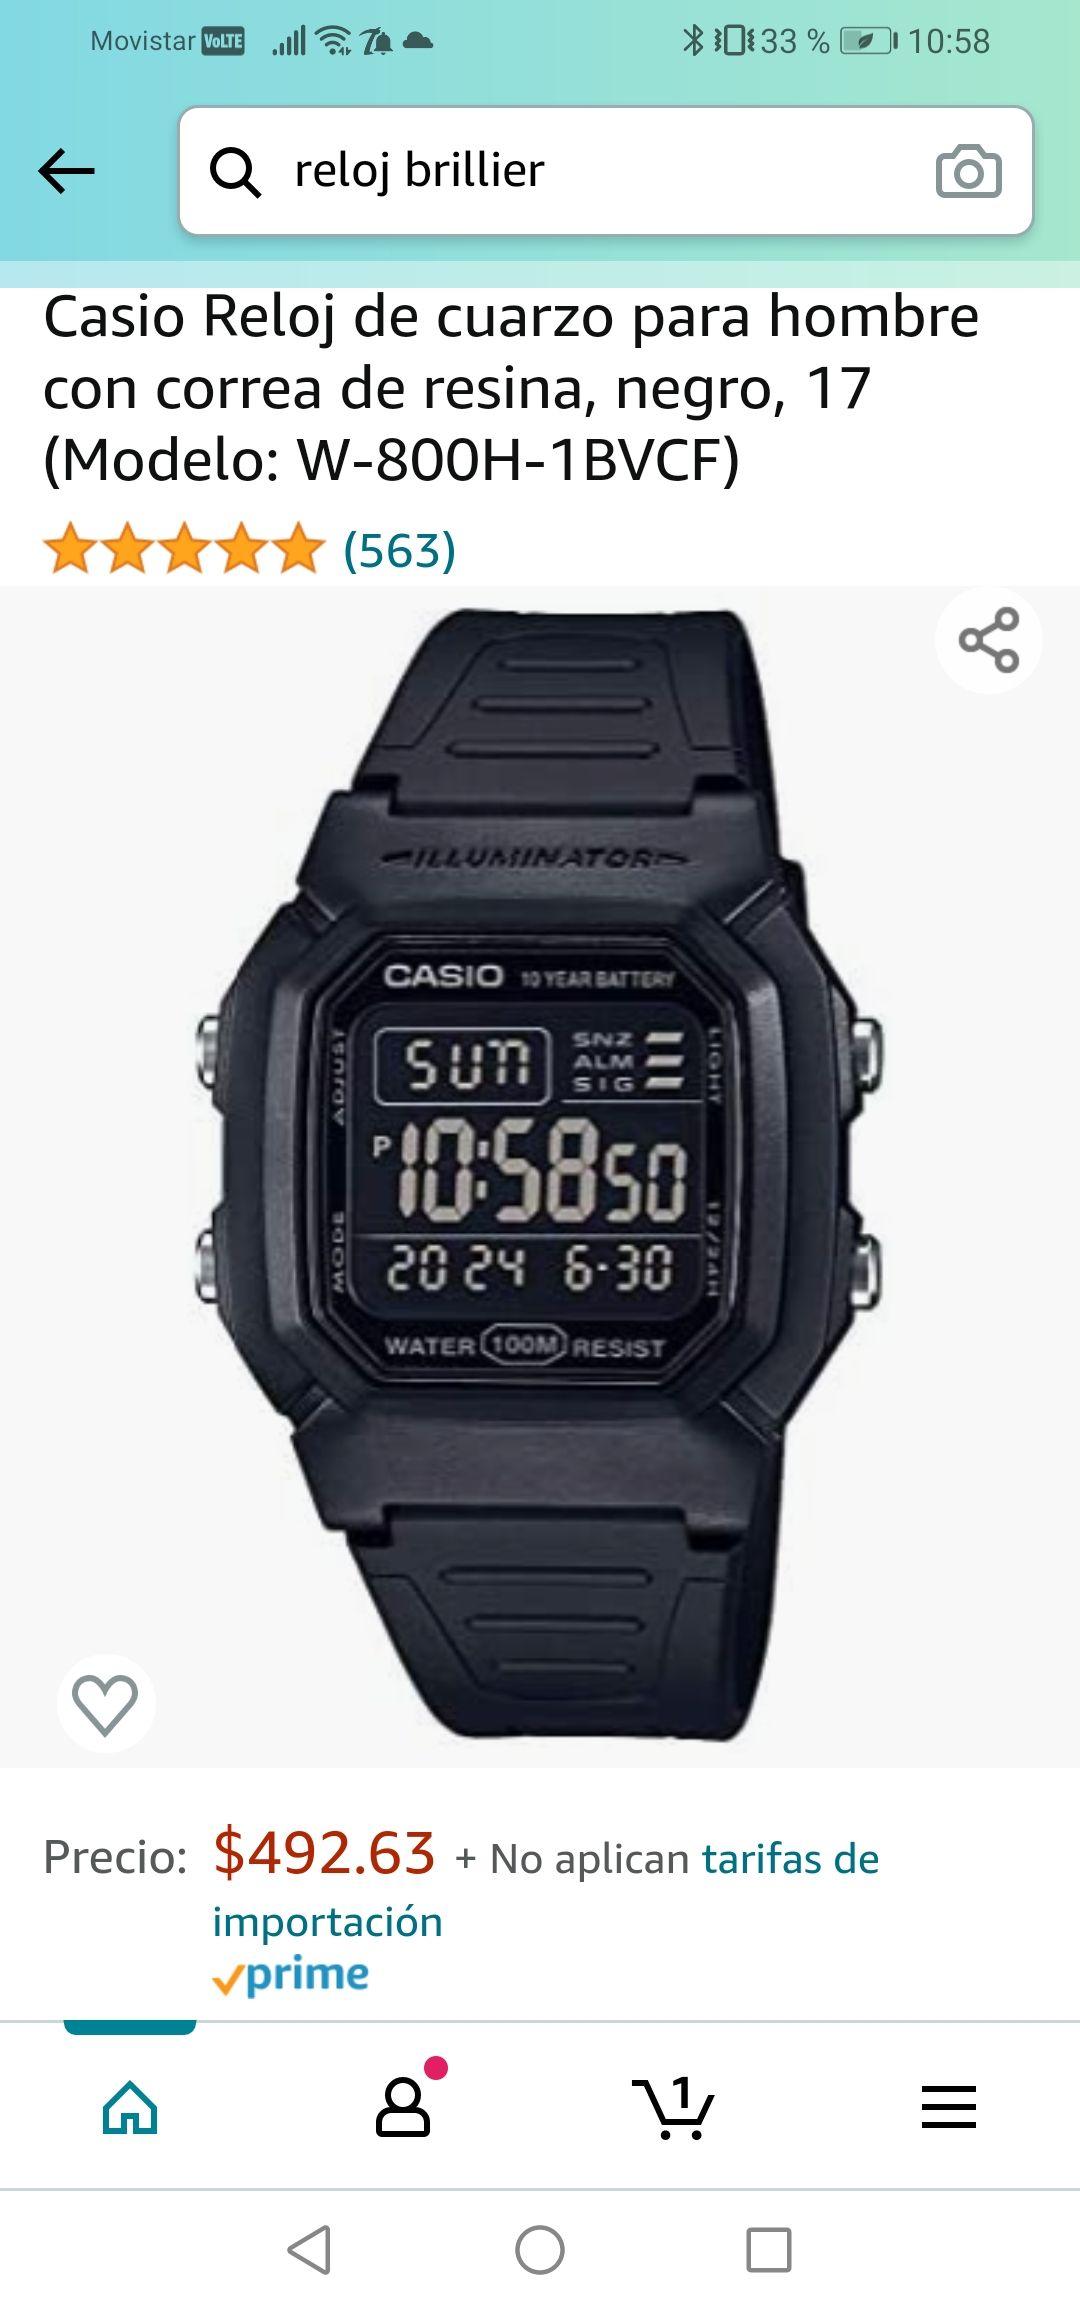 Amazon: Casio Reloj de cuarzo para hombre con correa de resina, negro, 17 (Modelo: W-800H-1BVCF